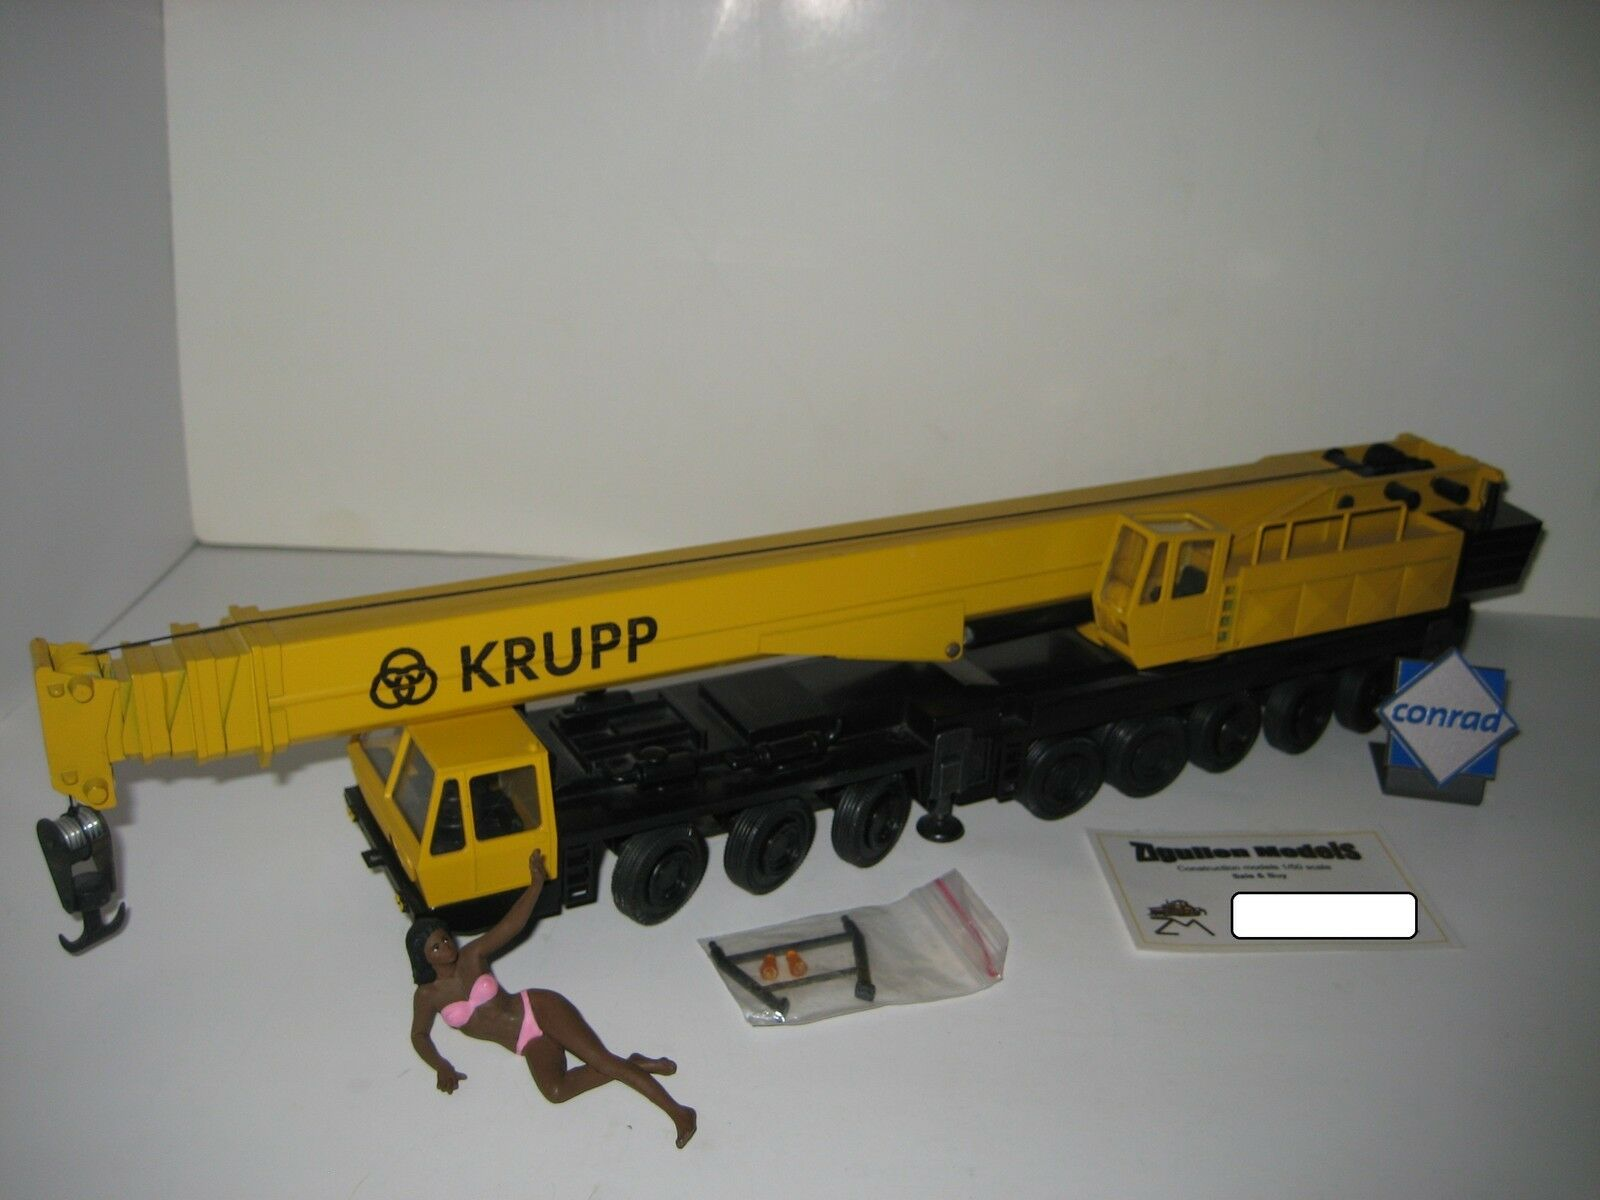 Krupp Gmt 250 Bil Crane gul35;2077.2 Conrad 1 50